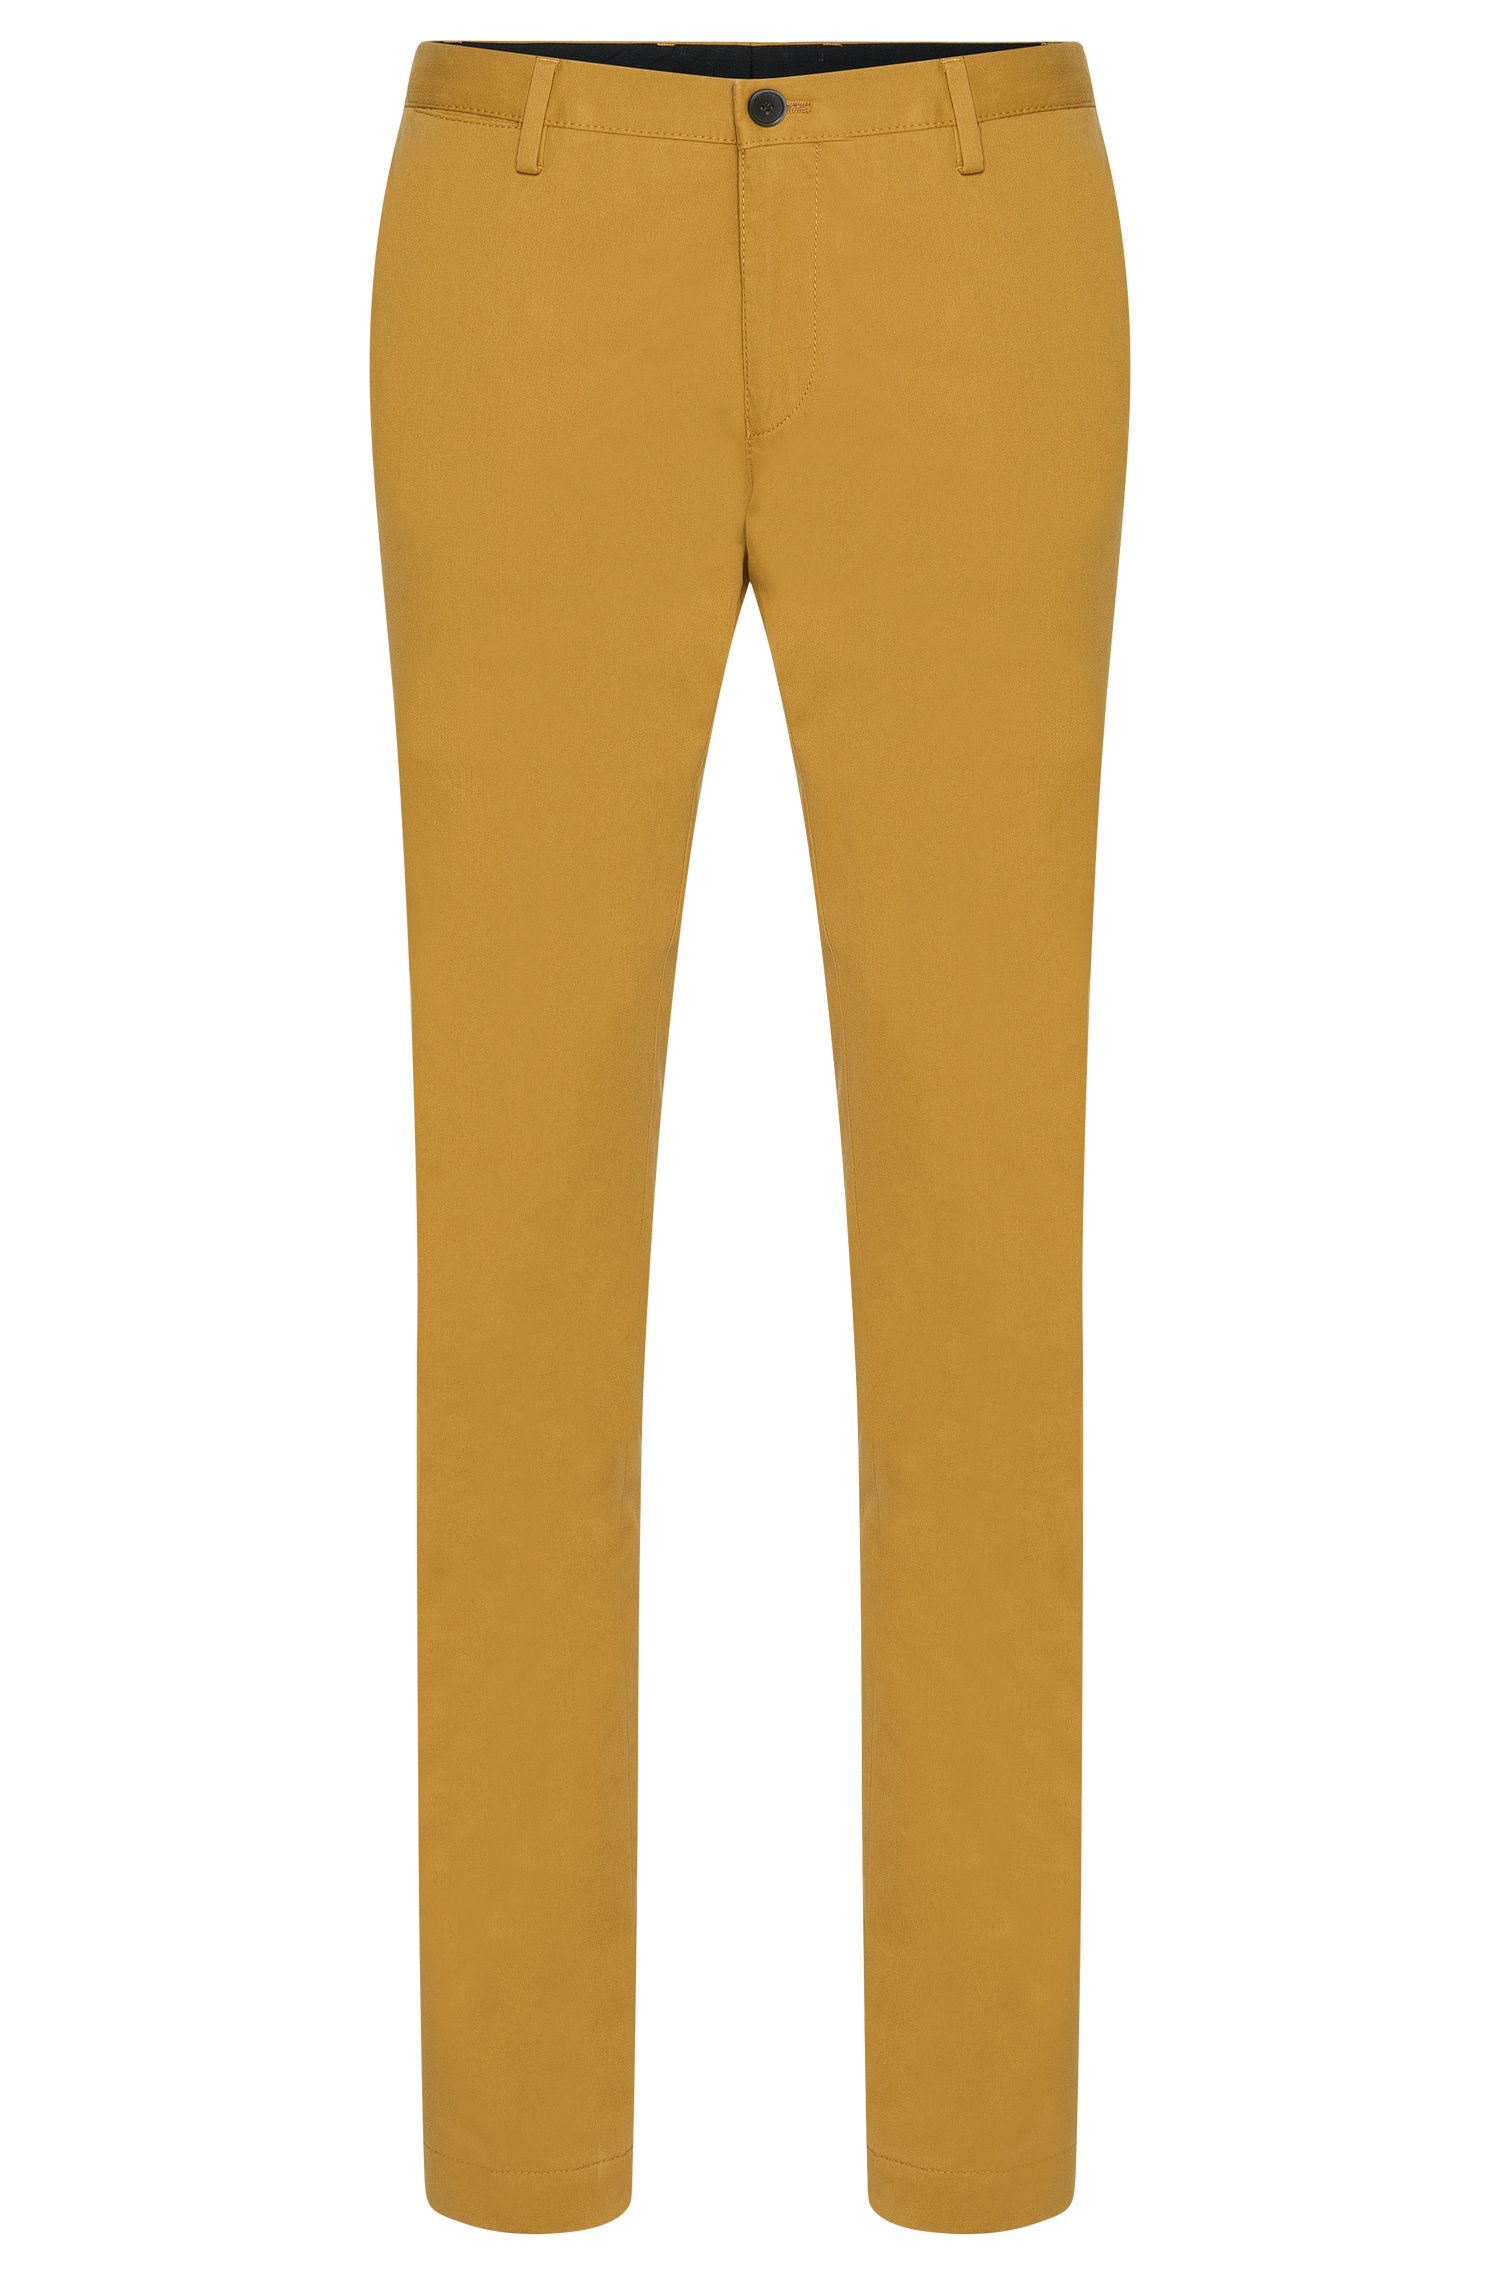 Stretch Cotton Chino Pant, Slim Fit   Stanino W, Green